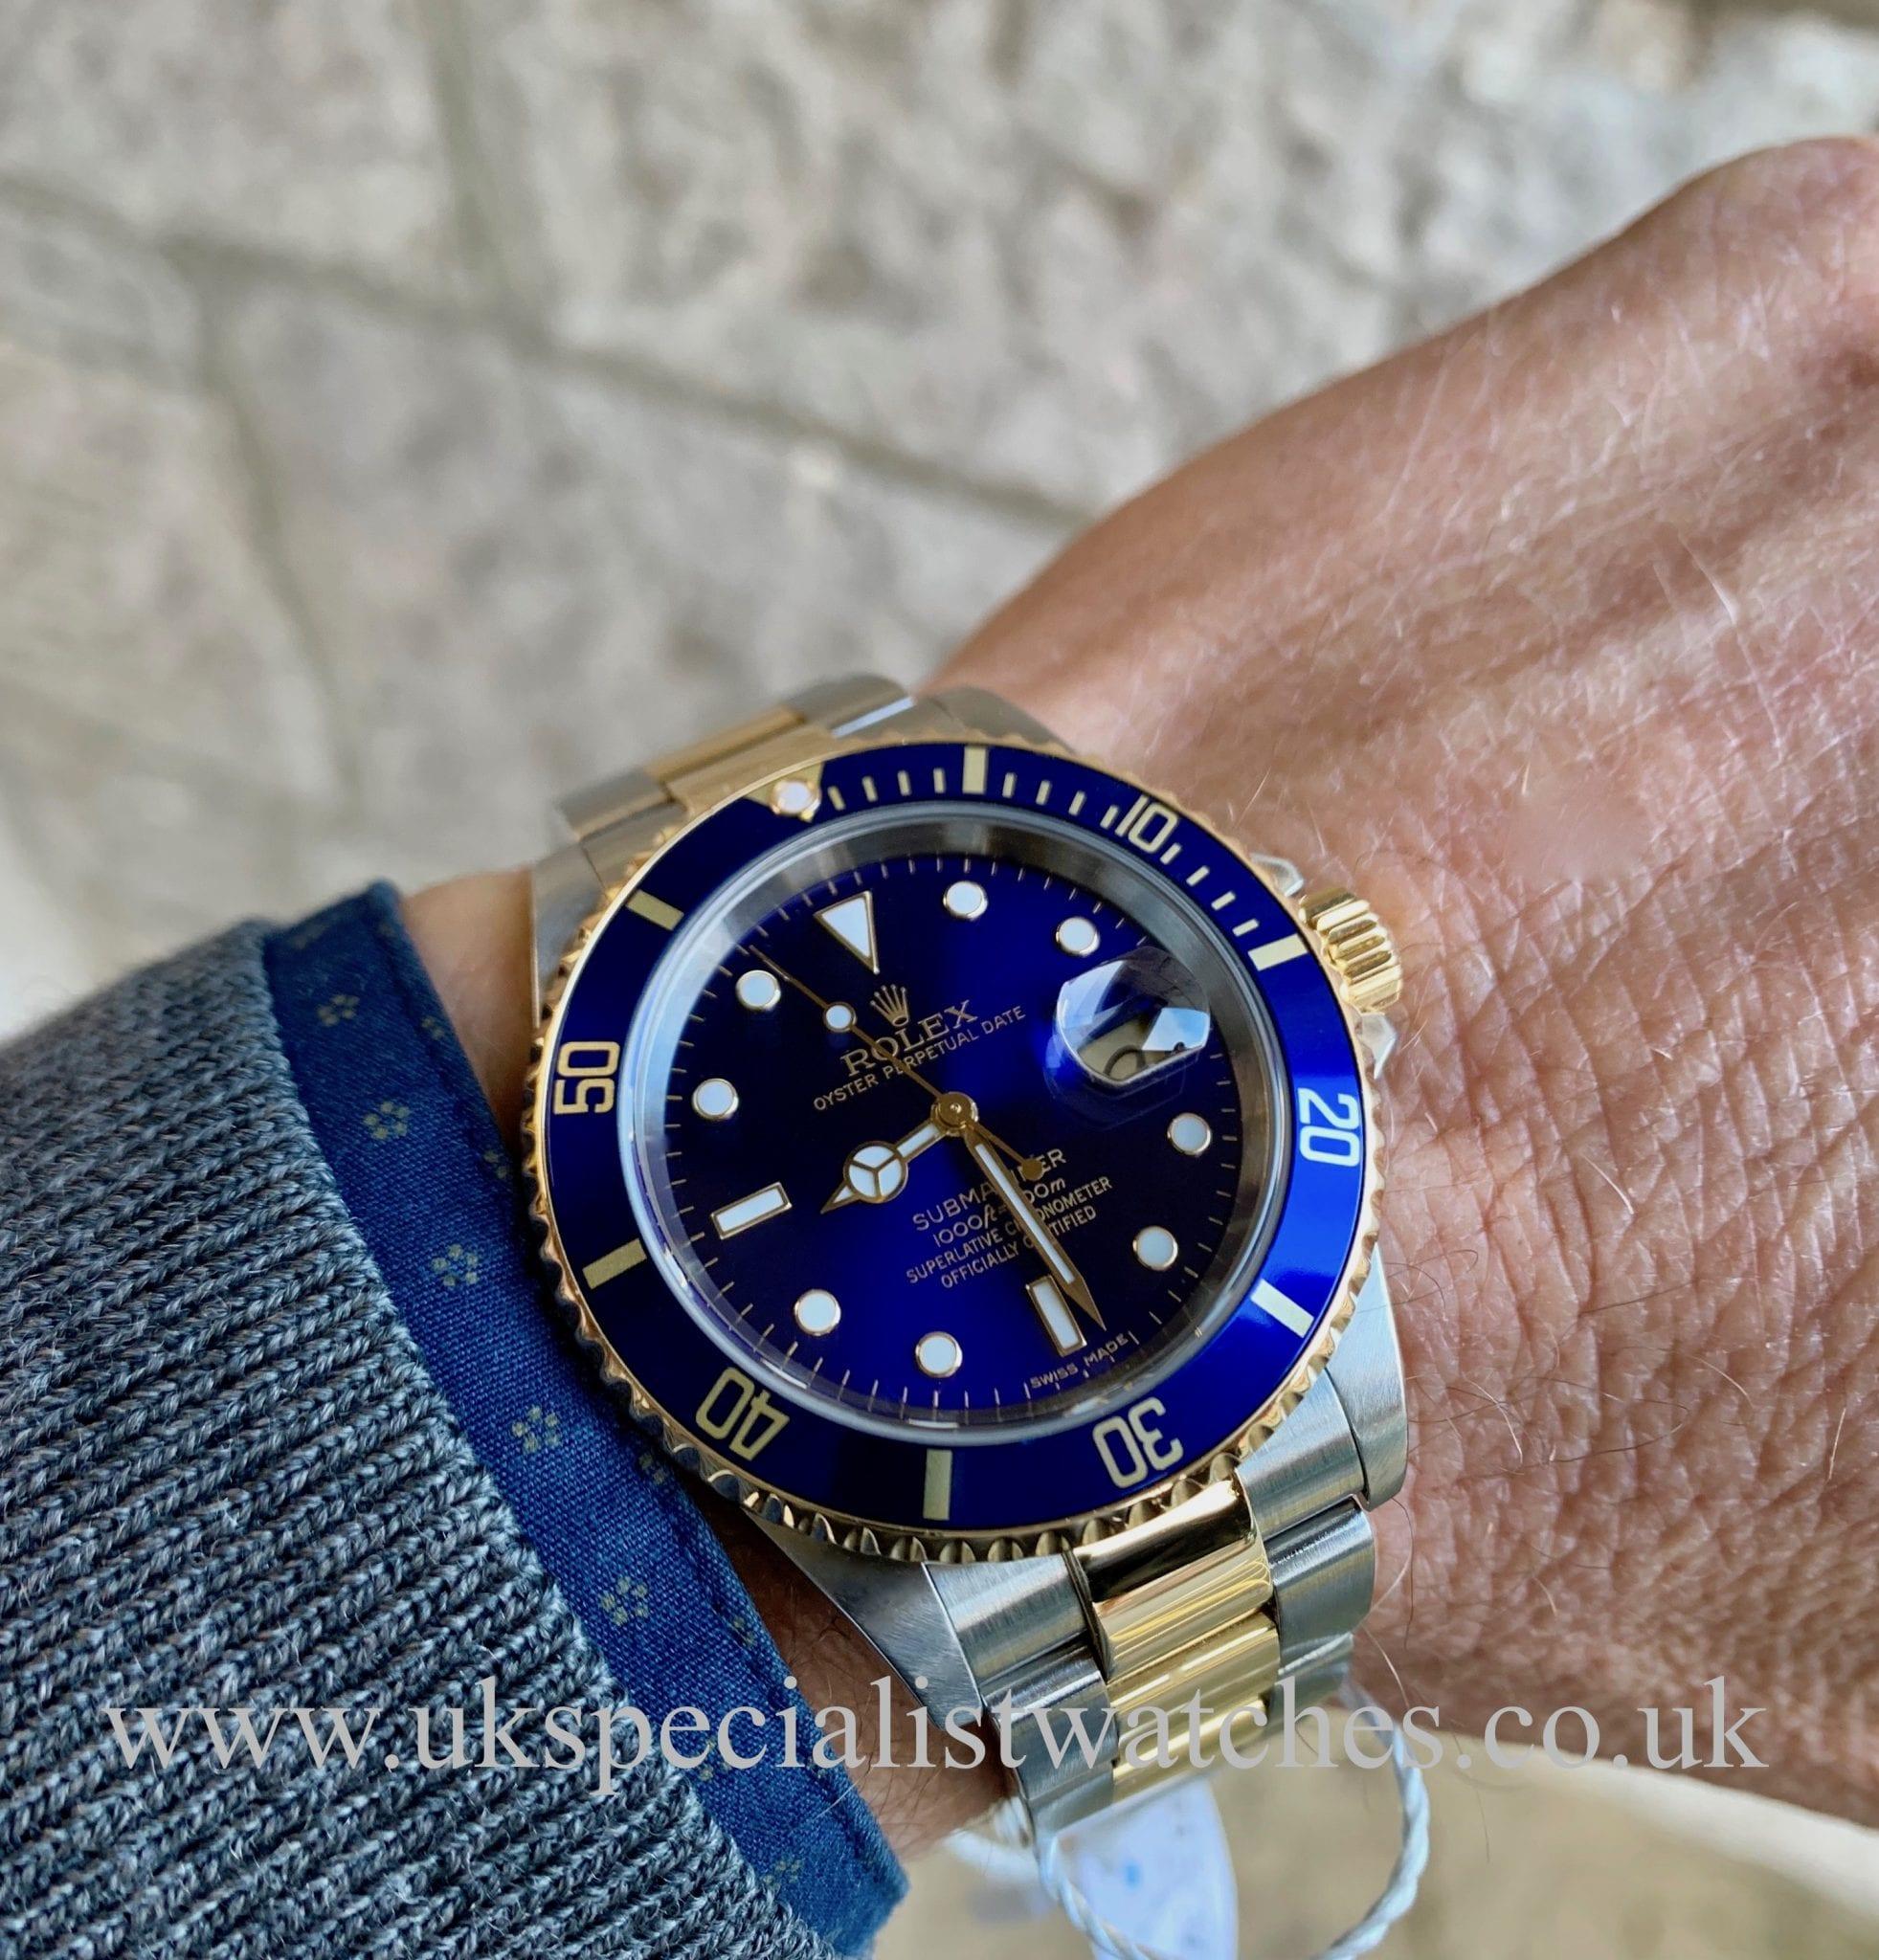 Rolex Submariner Date Blue Dial Steel Gold 16613 Full Set